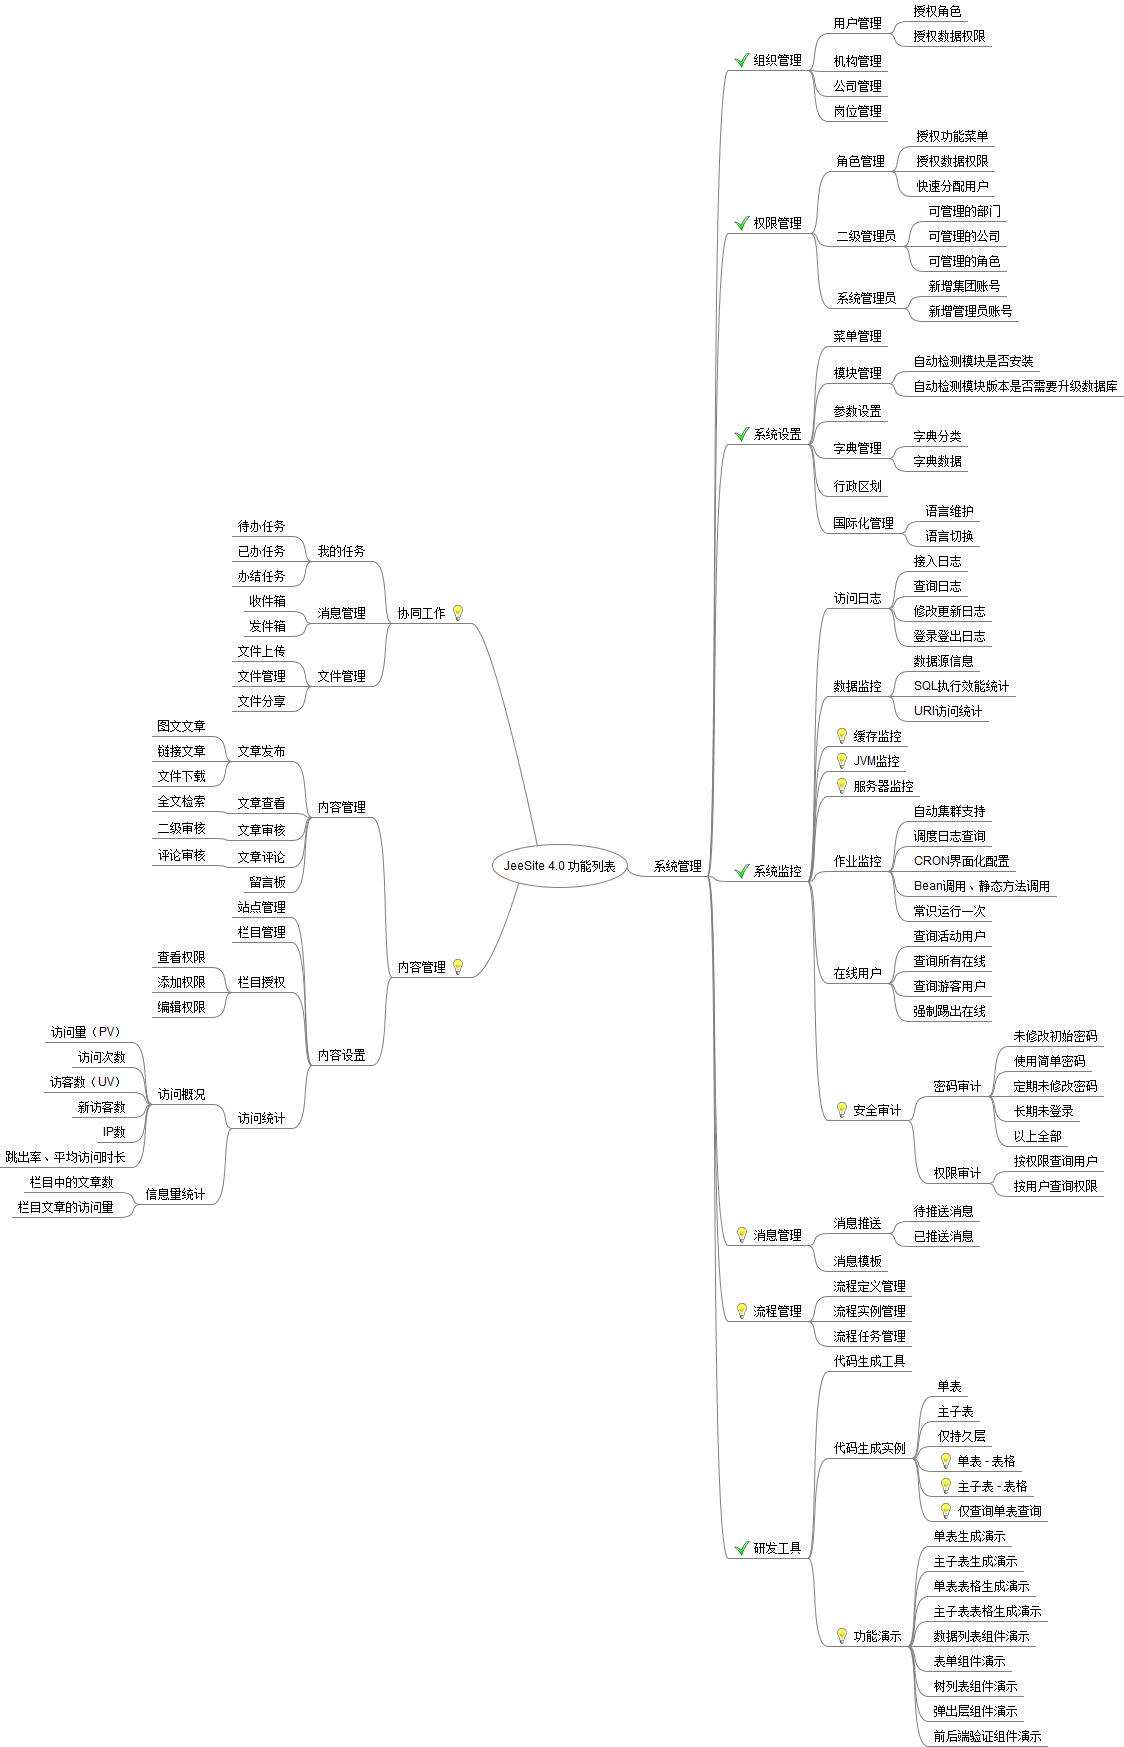 JeeSite 4.0 内置功能模块规划